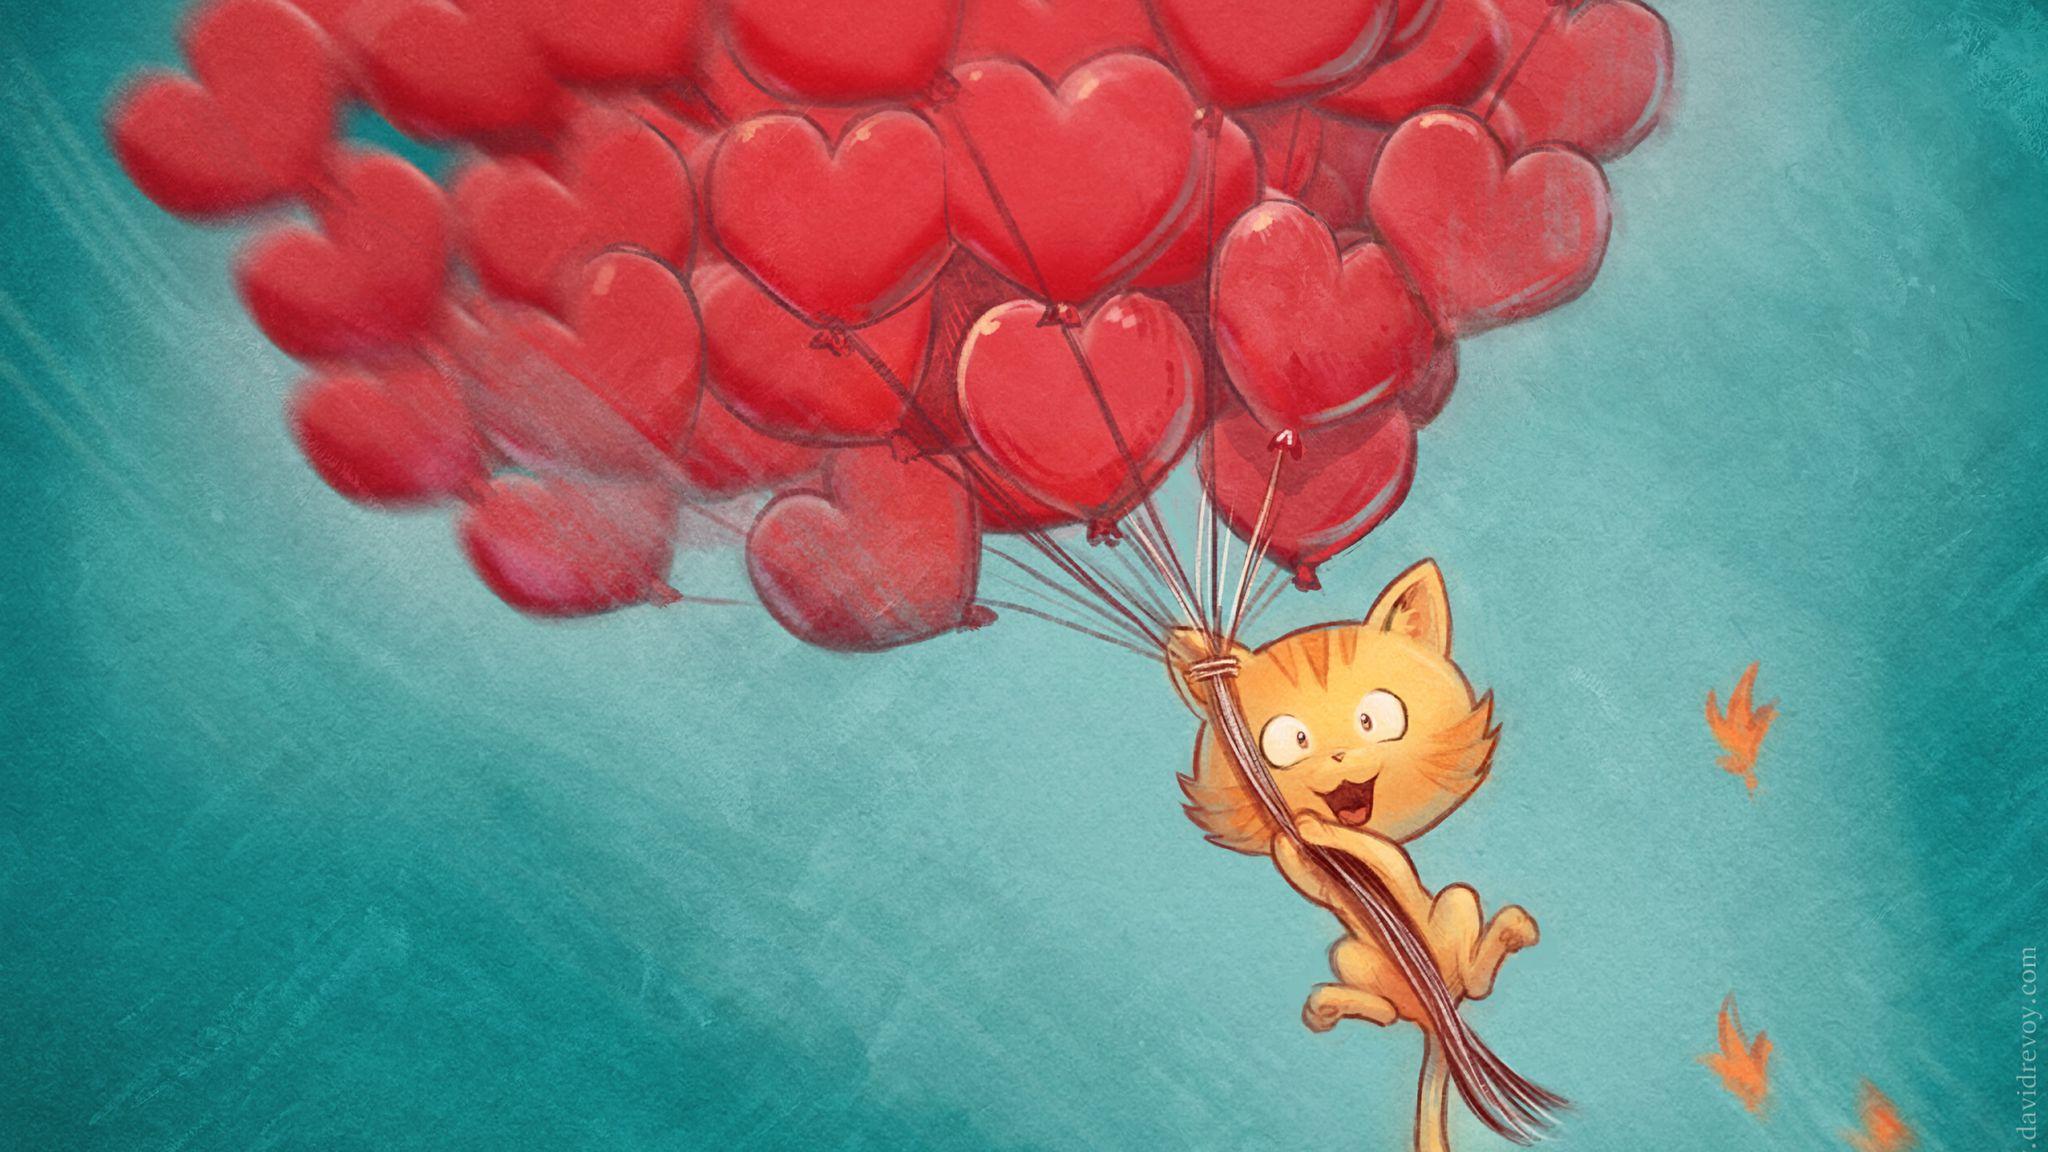 2048x1152 Wallpaper cat, balloons, hearts, flight, sky, art